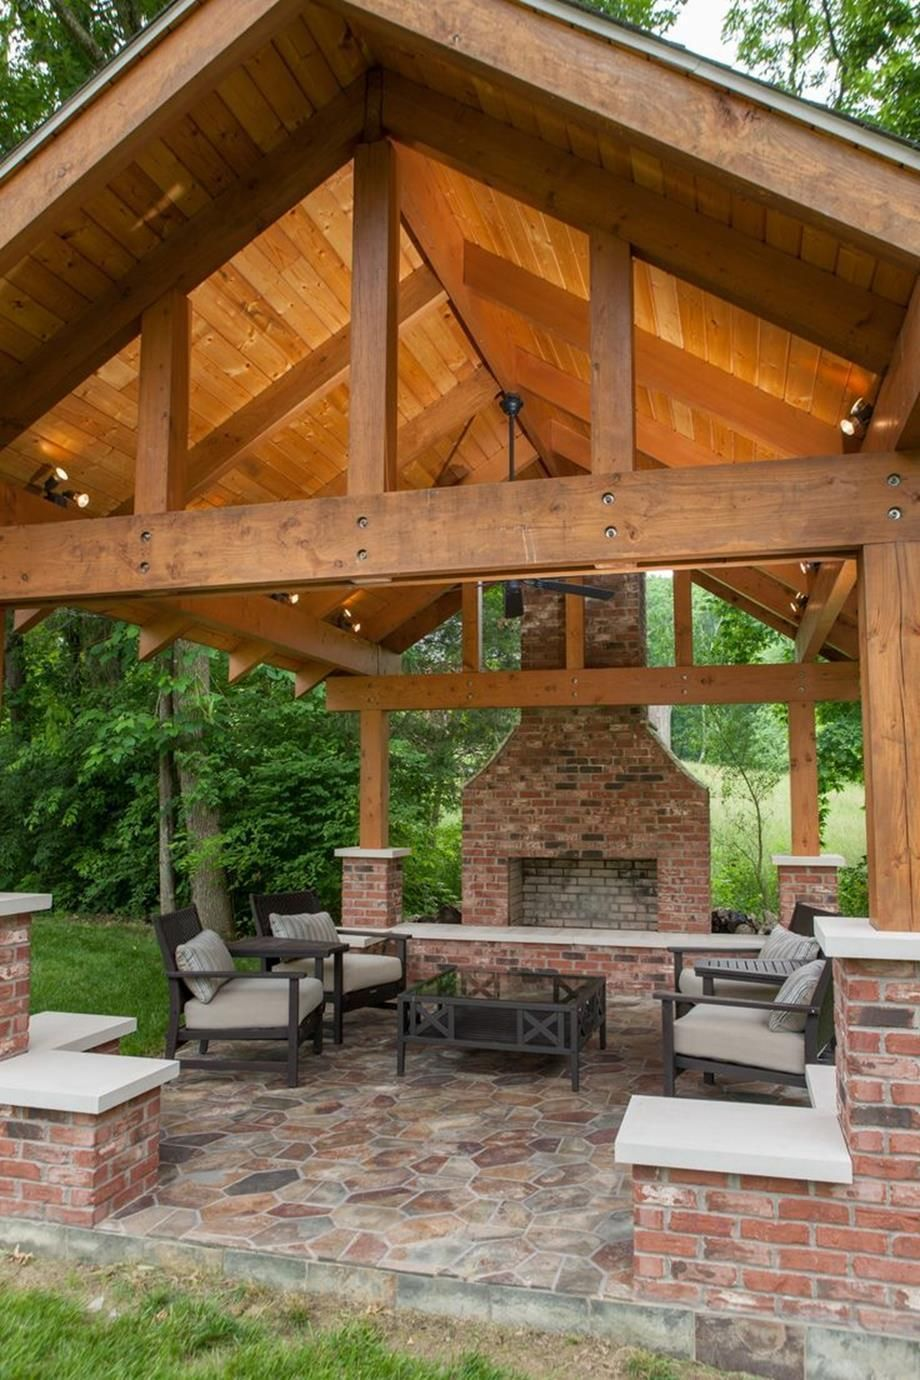 Inexpensive Backyard Pavilion Ideas 25